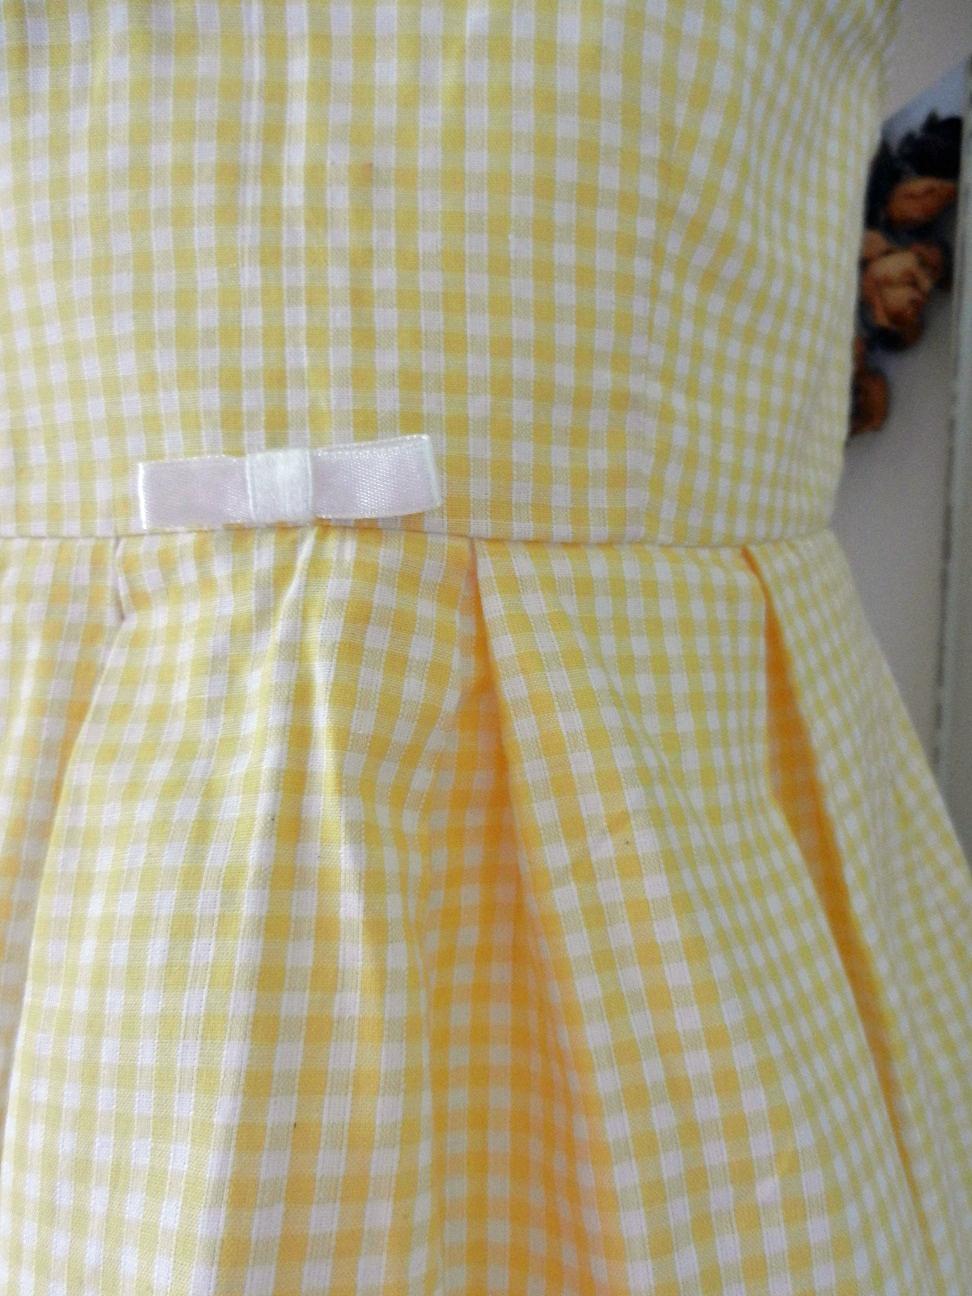 Duchesse or ange doa 71 duchesse or ange robe enfant vichy jaune yellow gingham dress child c